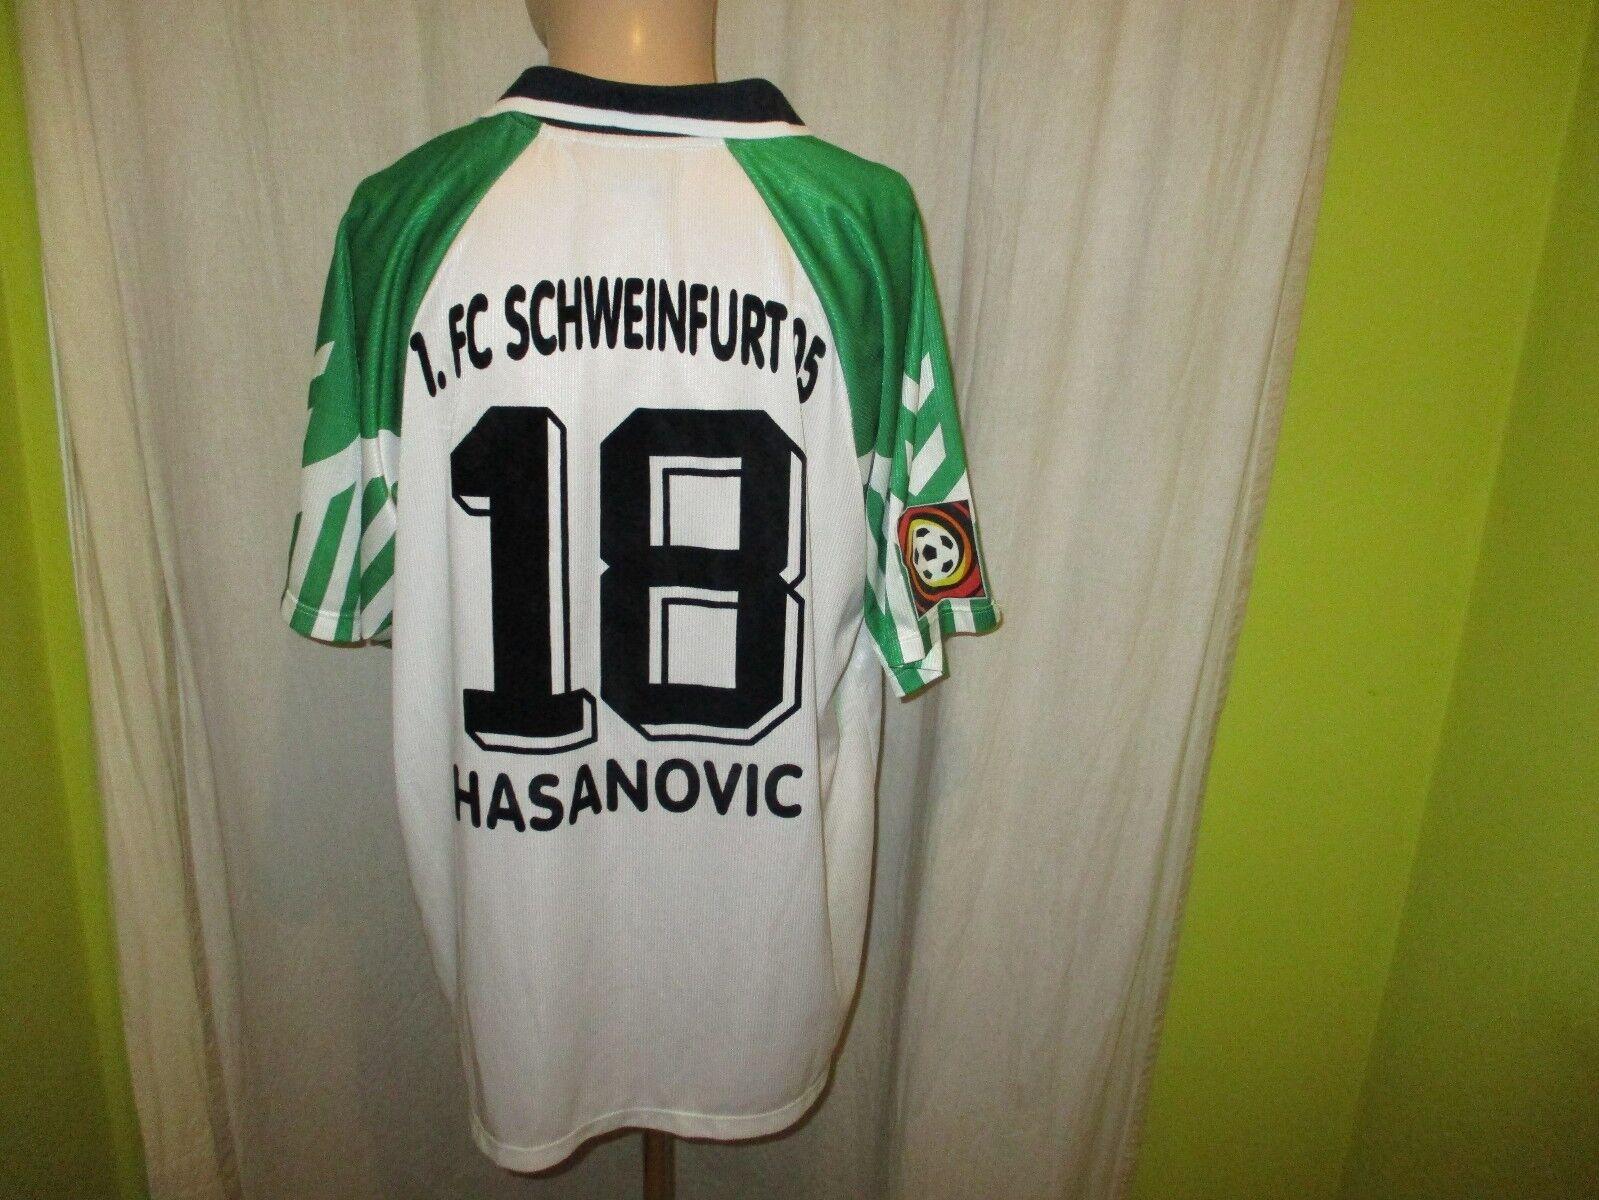 1.FC 1.FC 1.FC Schweinfurt 05 hummel Matchworn Trikot 2001 02 + Nr.18 Hasanovic Gr.XXL  | Export  a6499b